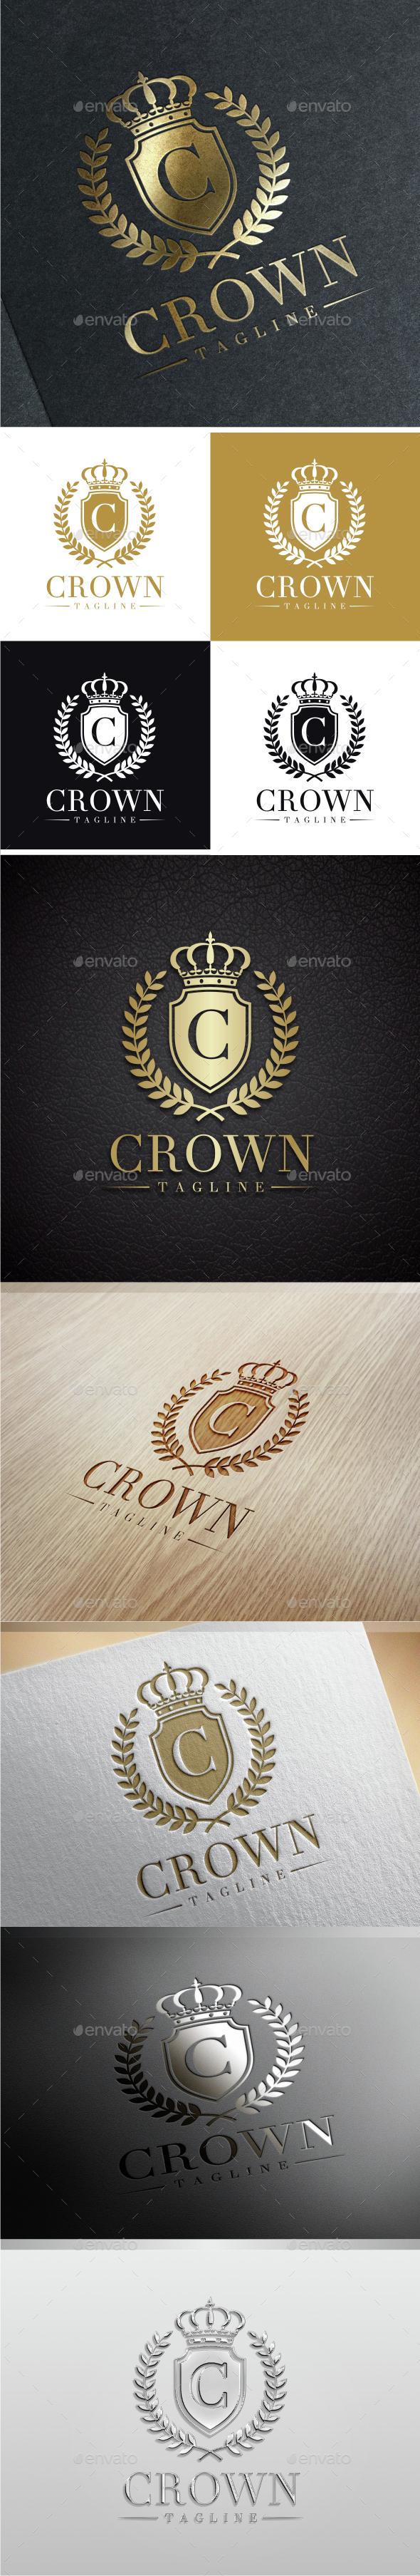 Crown Luxury - Letter C Logo